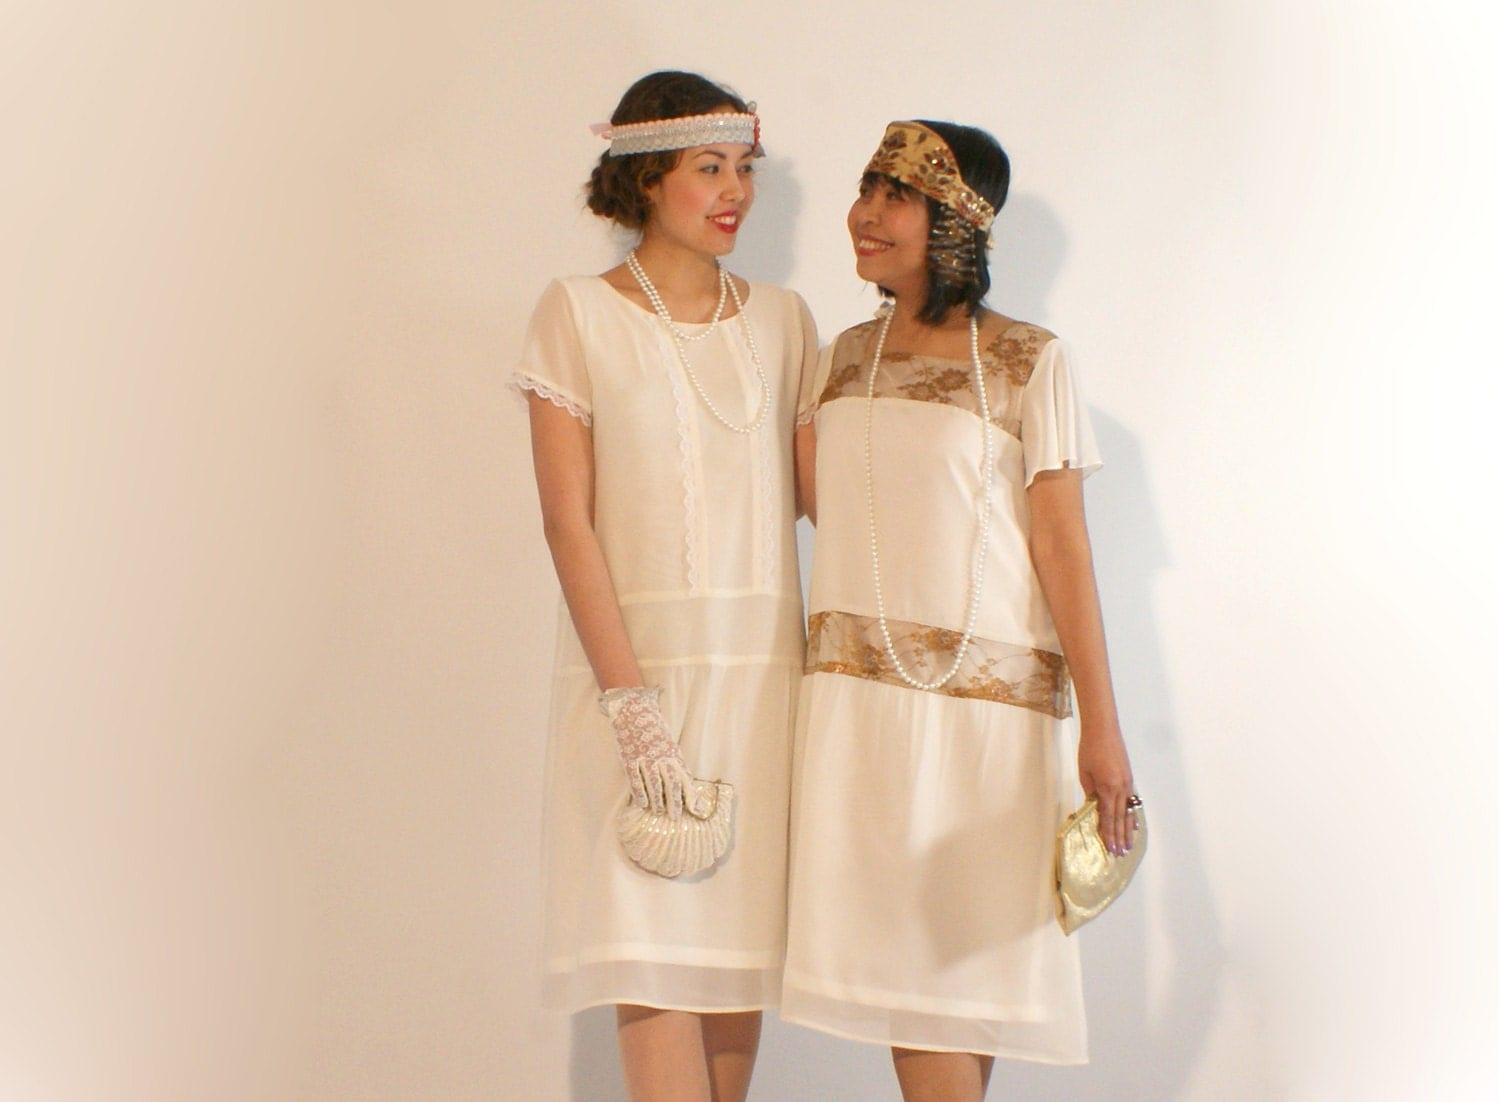 Bridesmaid dresses charleston sc amore wedding dresses bridesmaid dresses charleston sc 74 ombrellifo Gallery